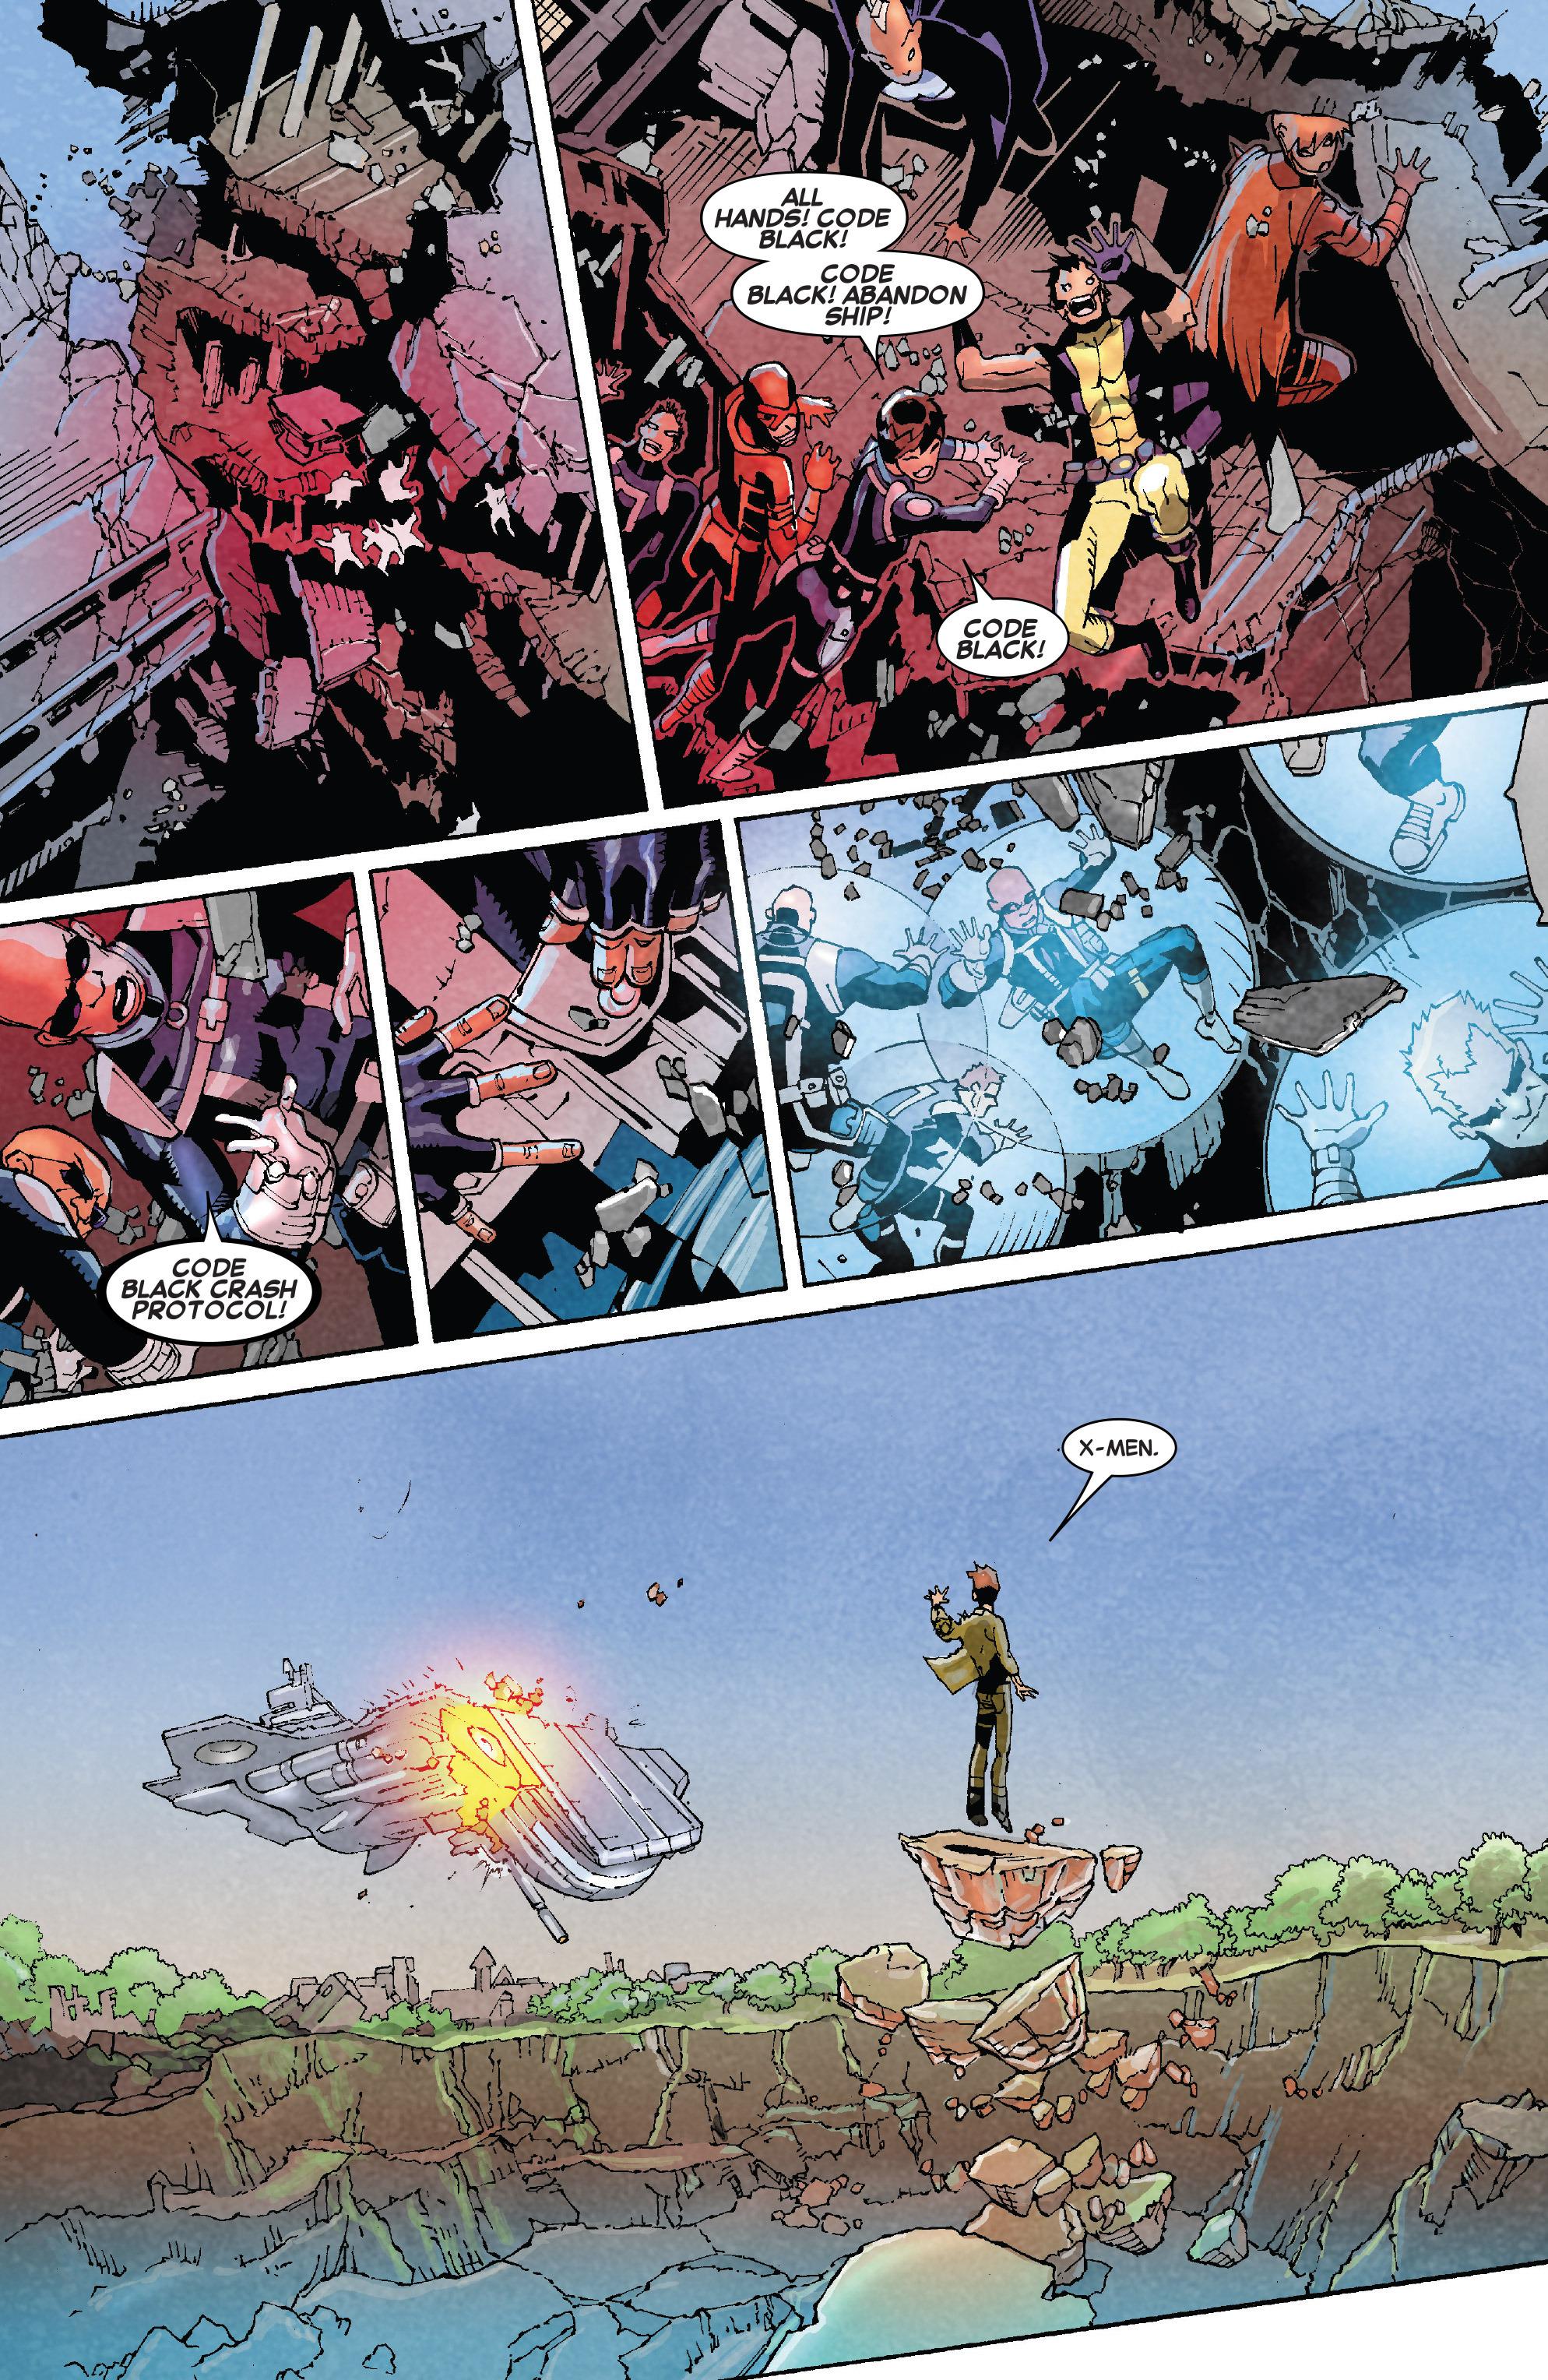 Read online Uncanny X-Men (2013) comic -  Issue # _TPB 5 - The Omega Mutant - 29